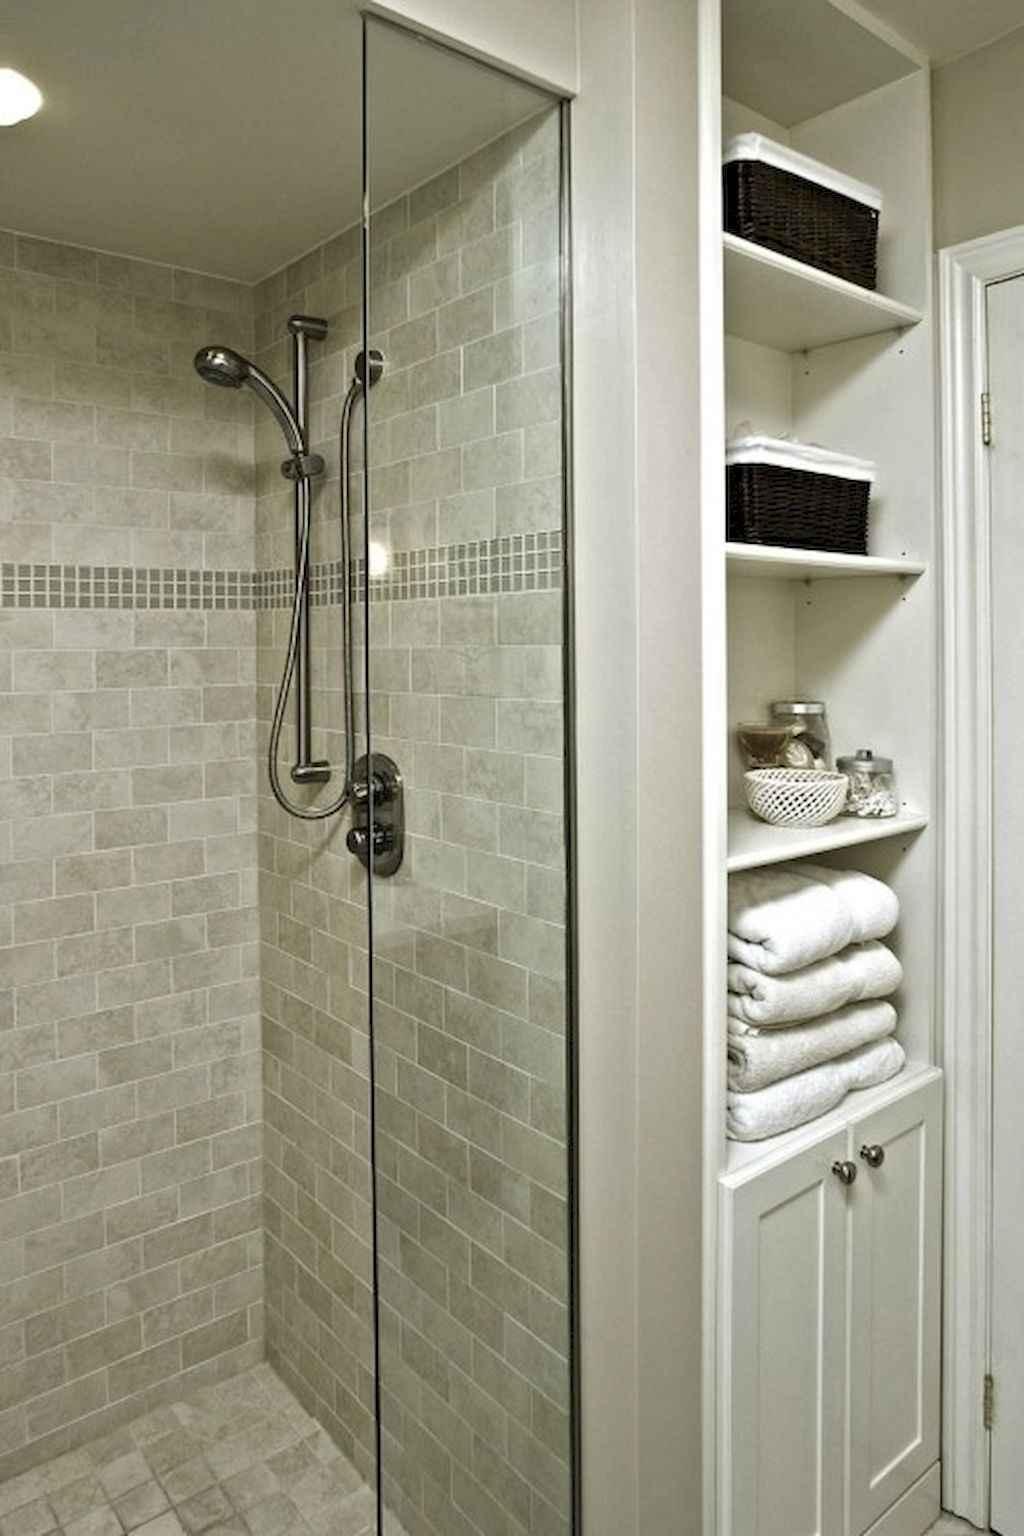 Cool bathroom storage shelves organization ideas (10)